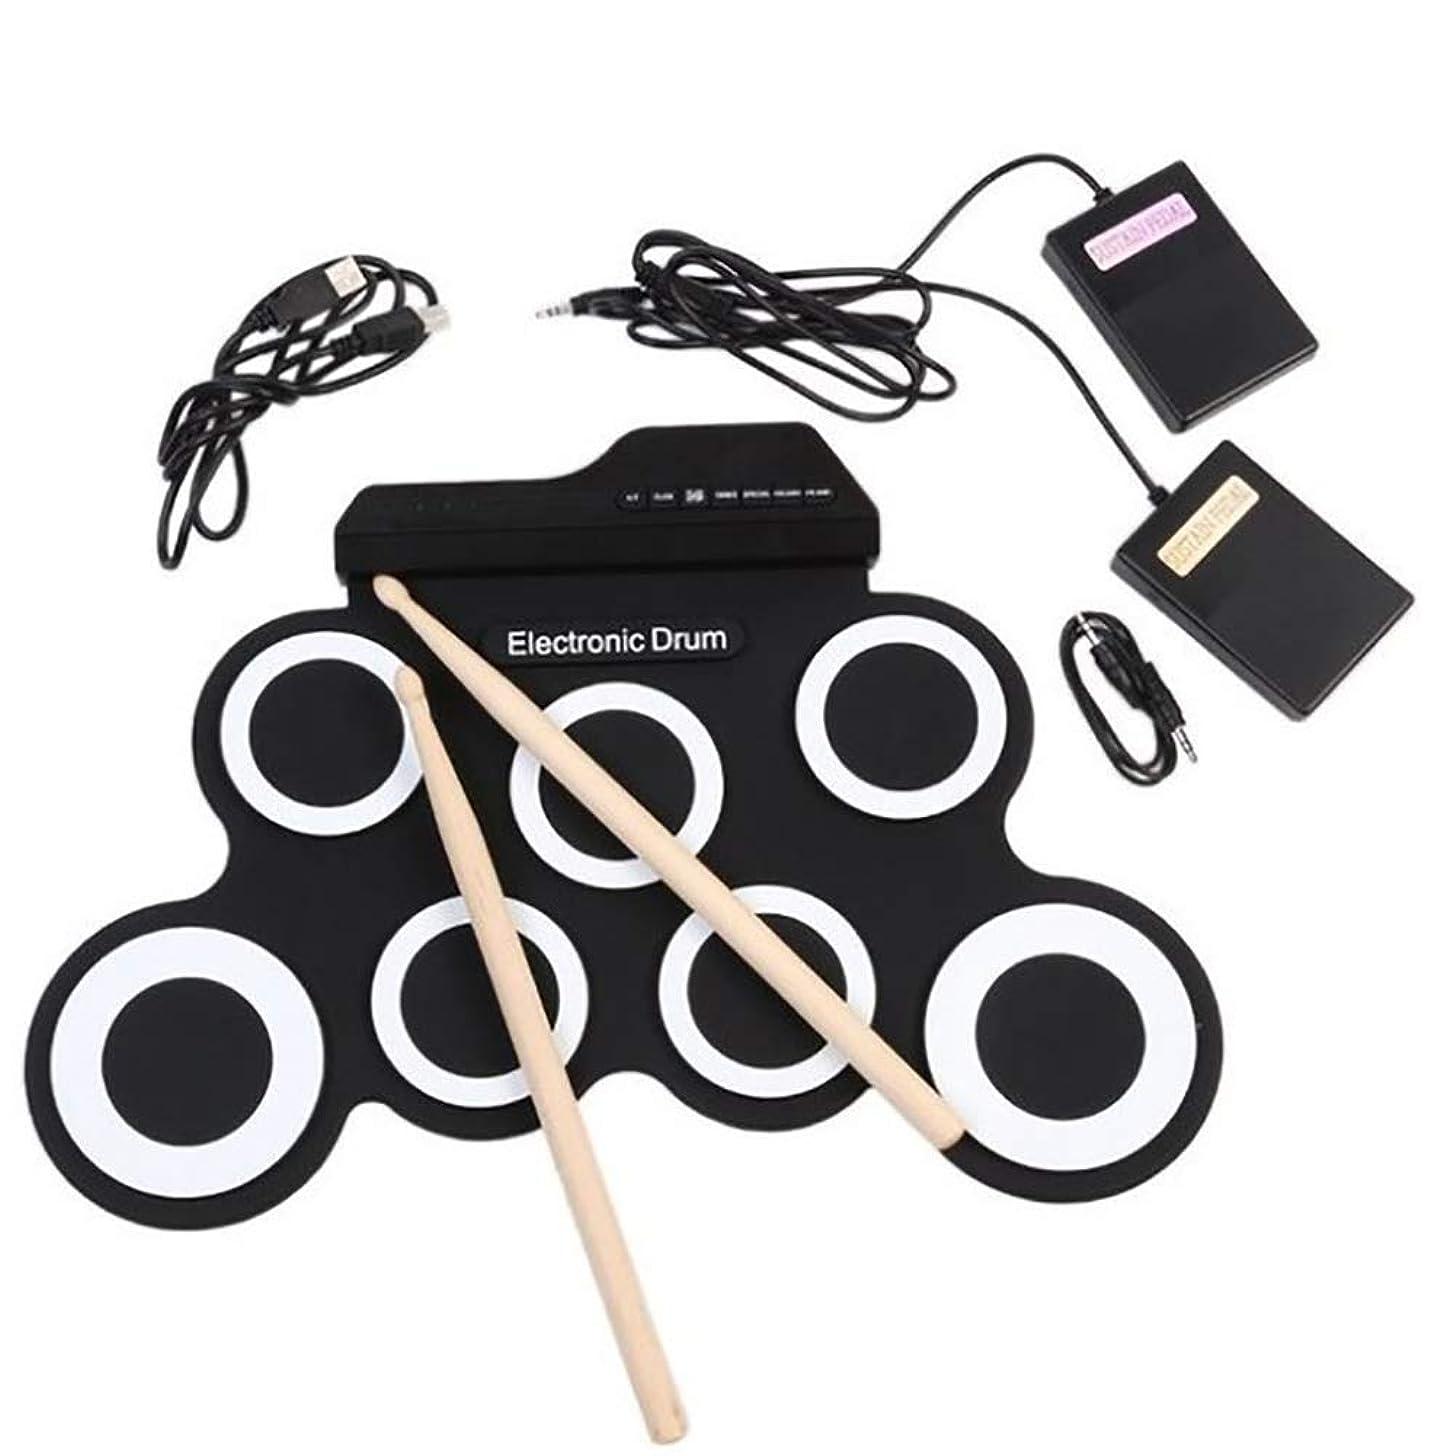 NUYI Hand Roll USB Electronic Drum Portable Drum Folding Drum Drum Children's Student Practice Drum